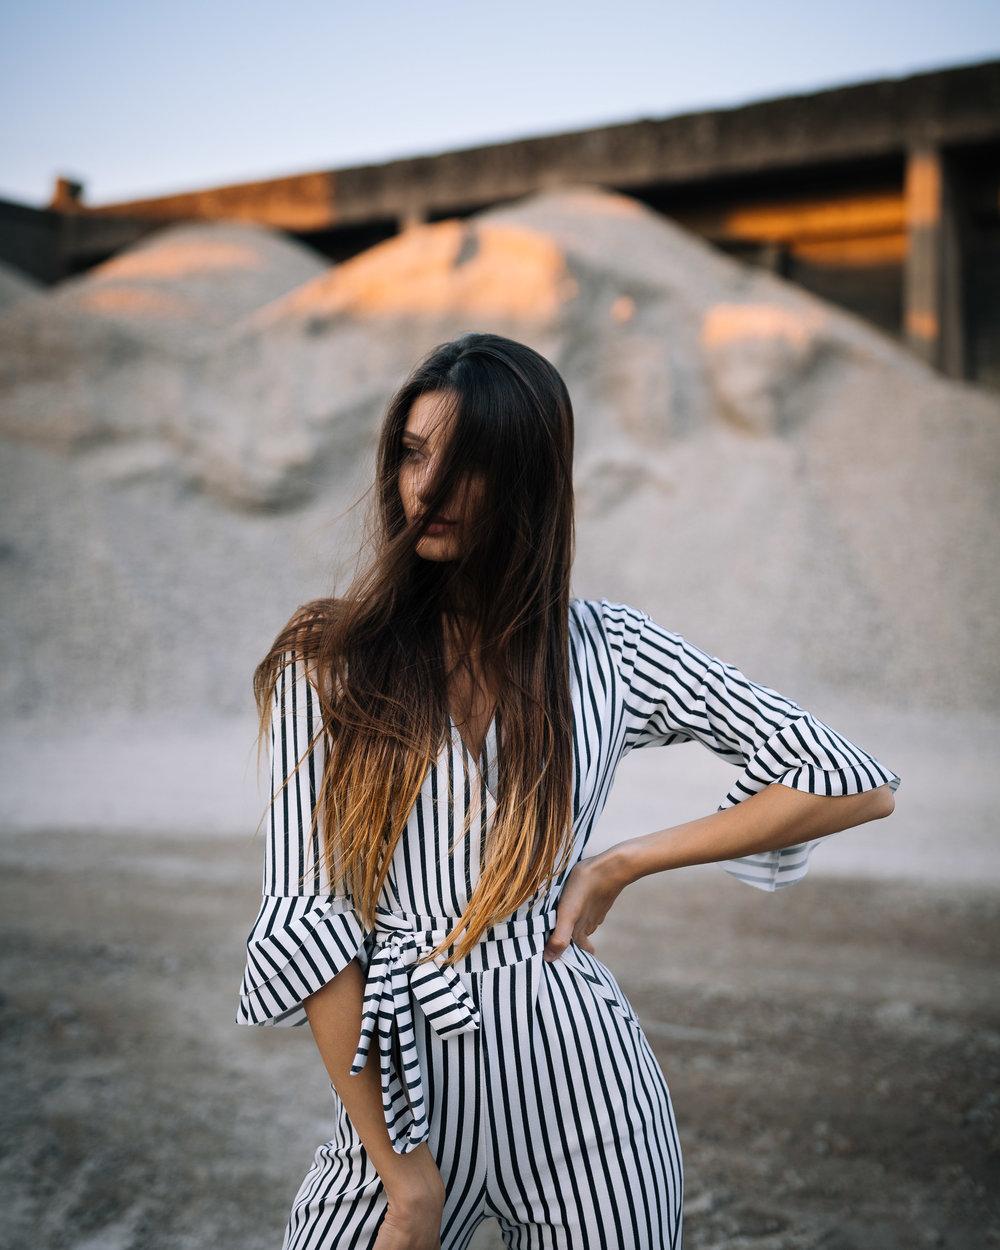 photographer-editorial-portrait-fashion-1-2.jpg